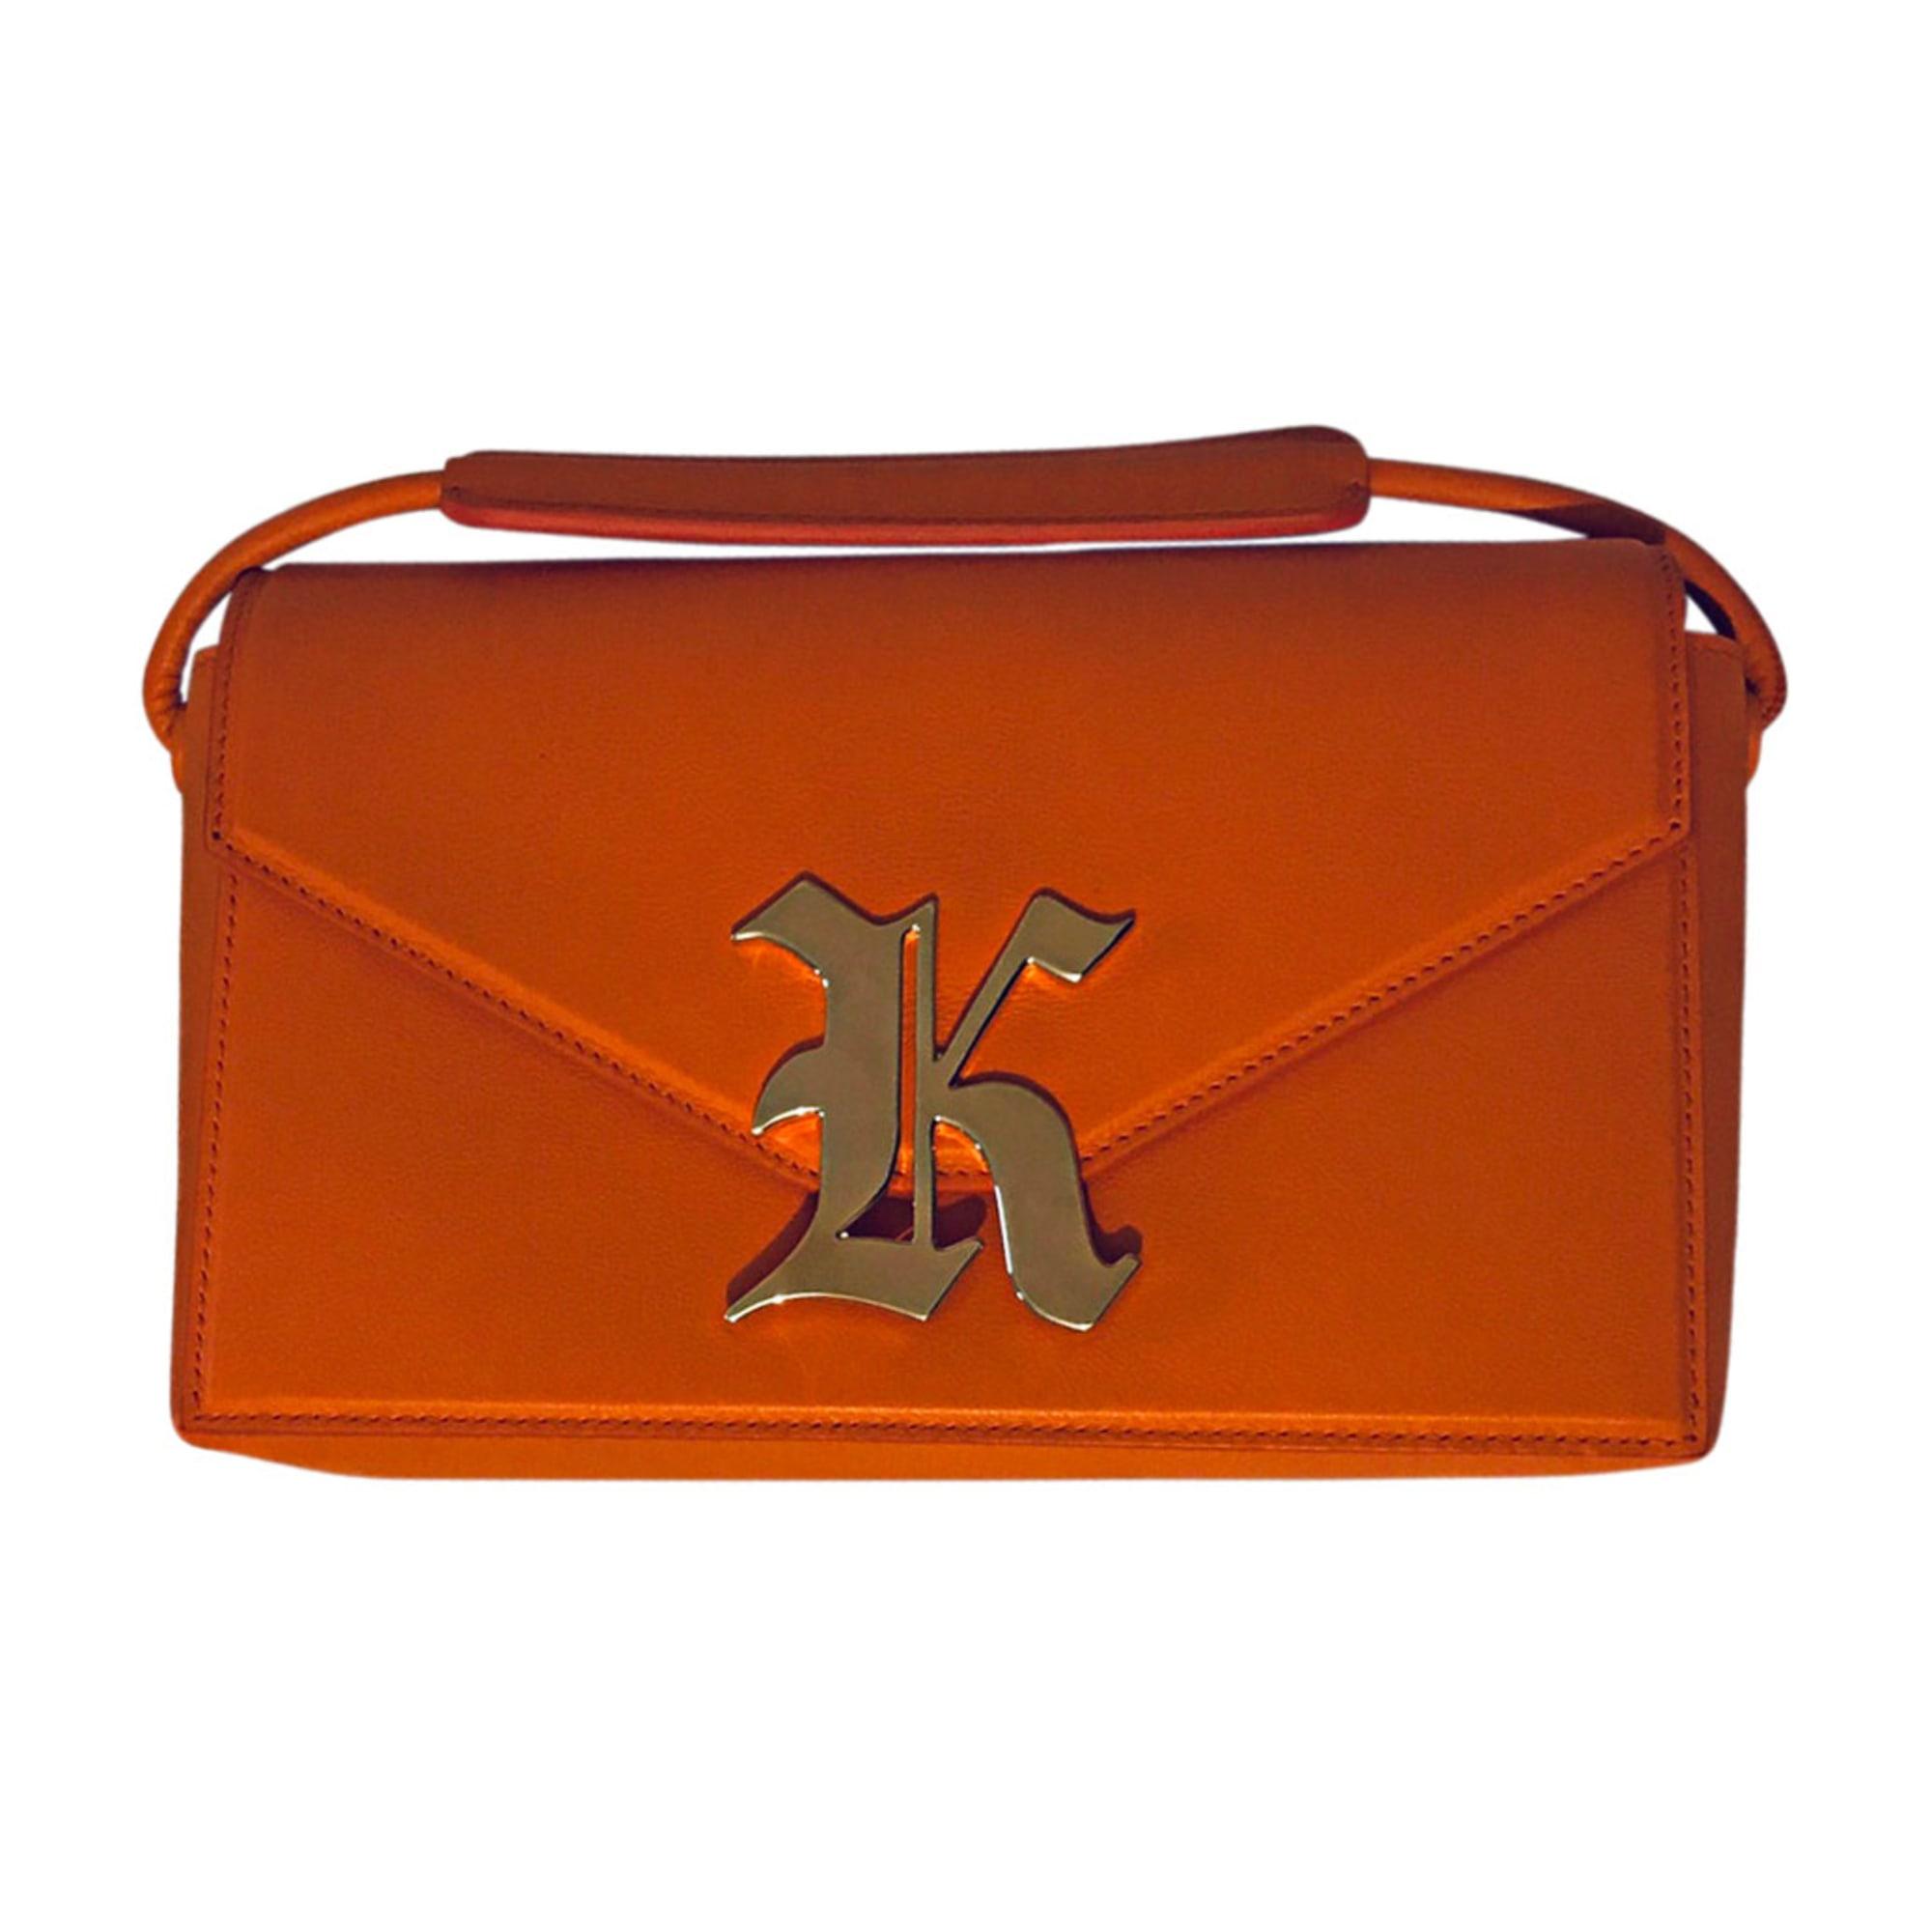 Pochette CHRISTOPHER KANE cuir orange